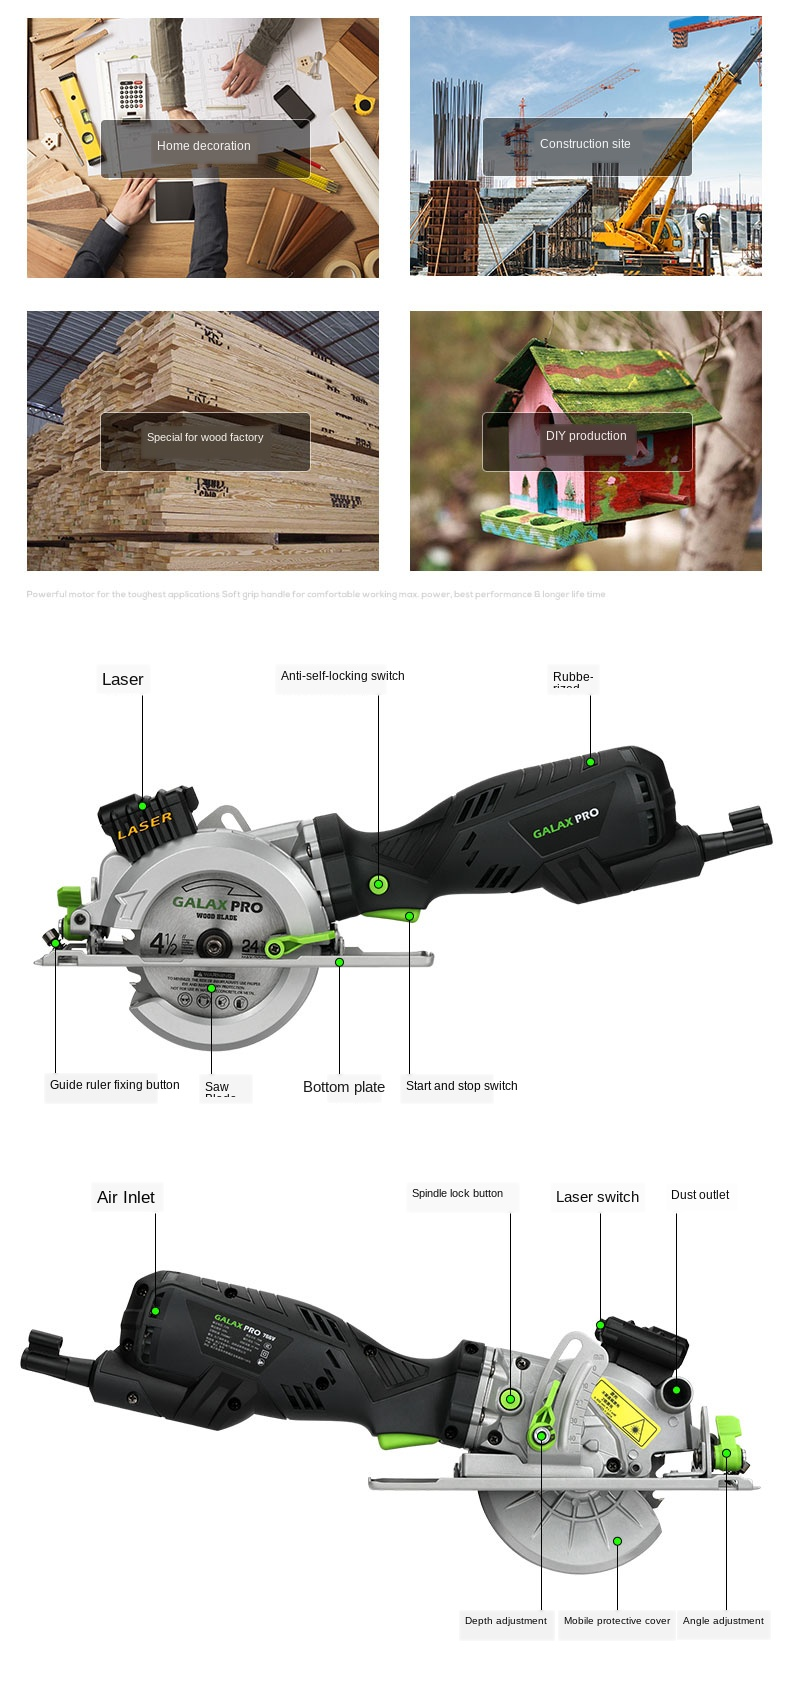 Handheld serra circular elétrica mini motosserra alça